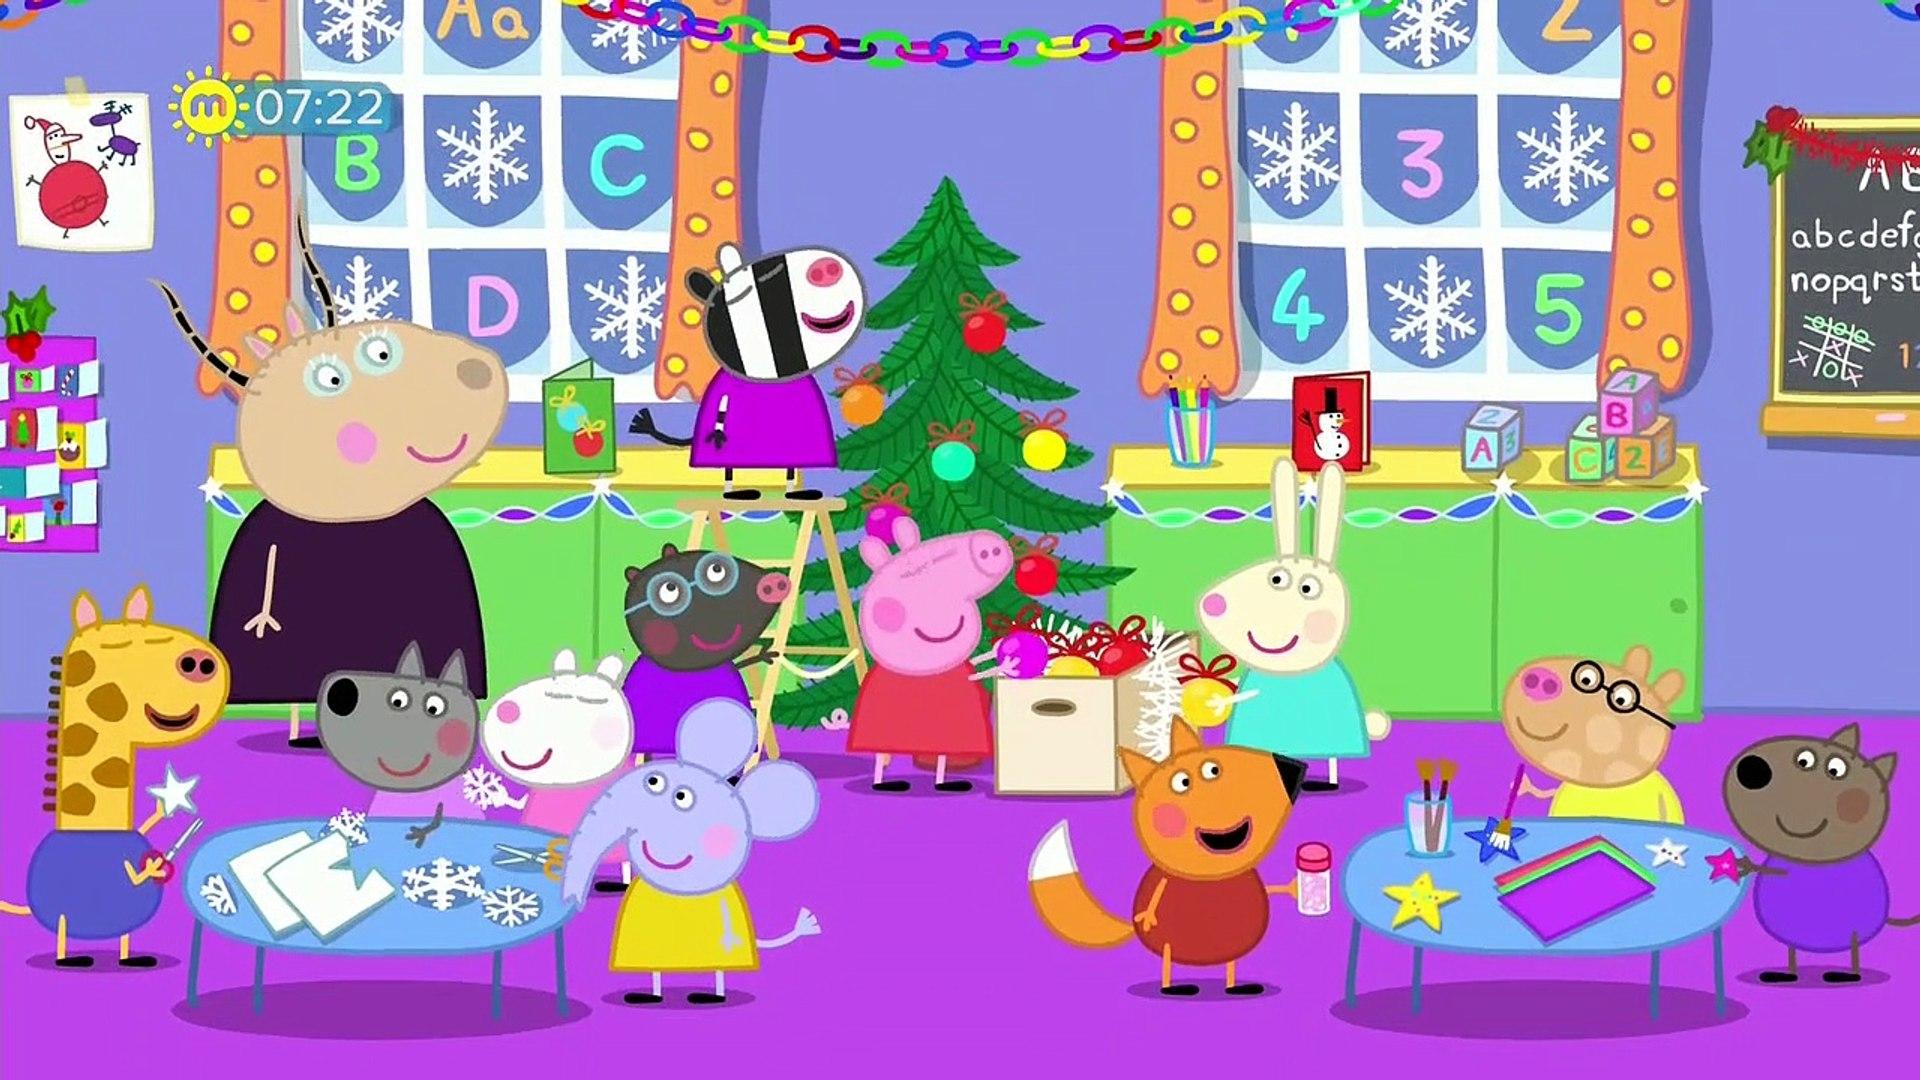 Peppa Pig Christmas.Peppa Pig S05e32 Father Christmas